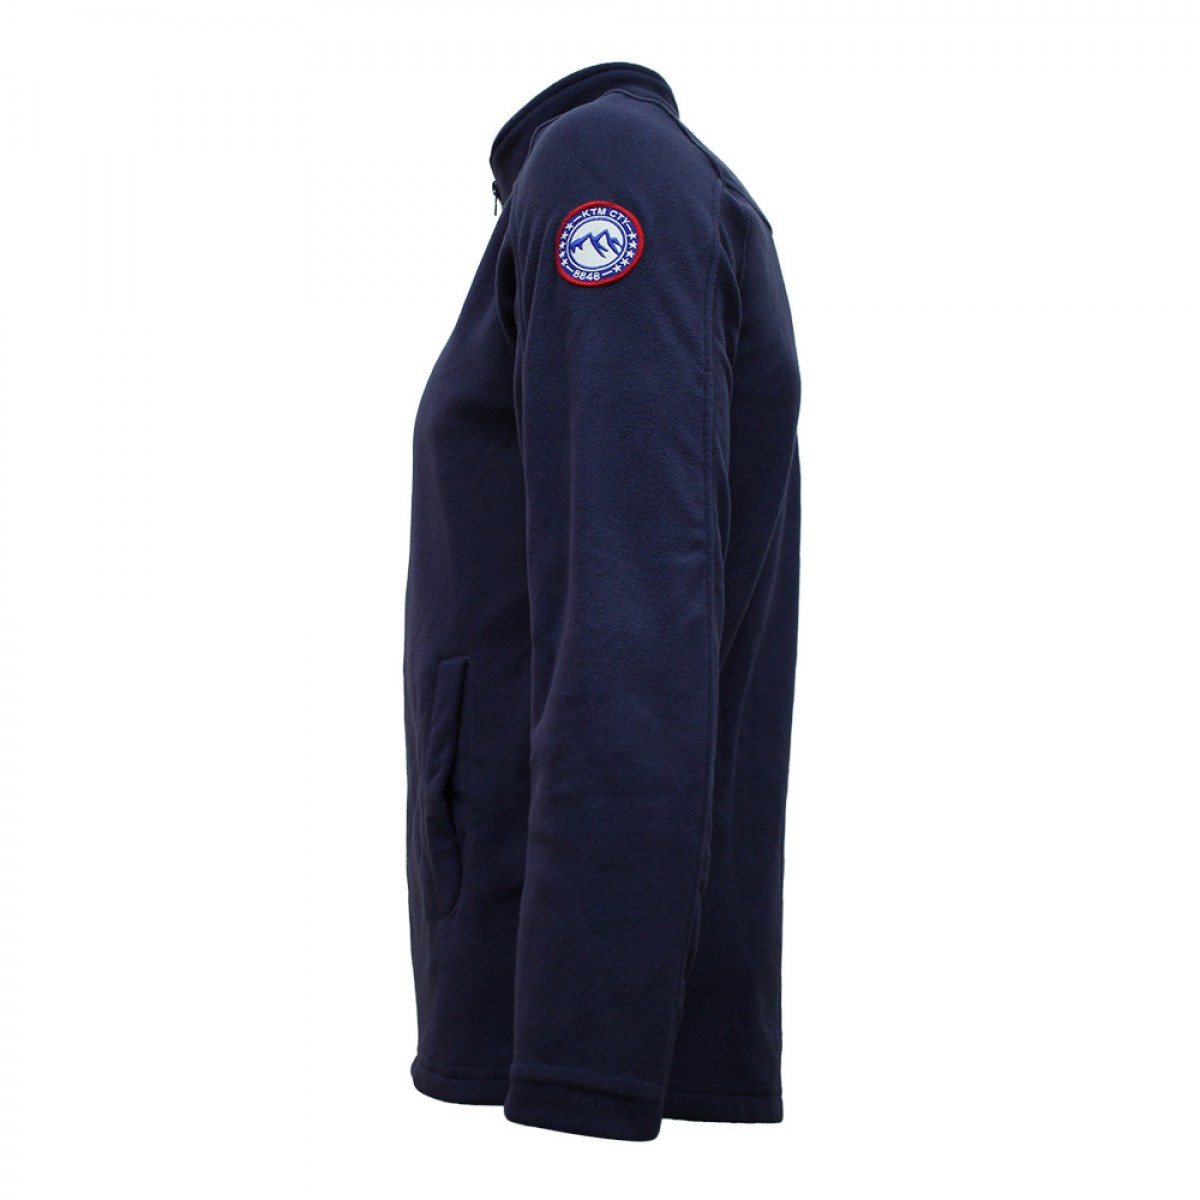 men-fleece-thick-layer-jacket-kfsj95626-5d